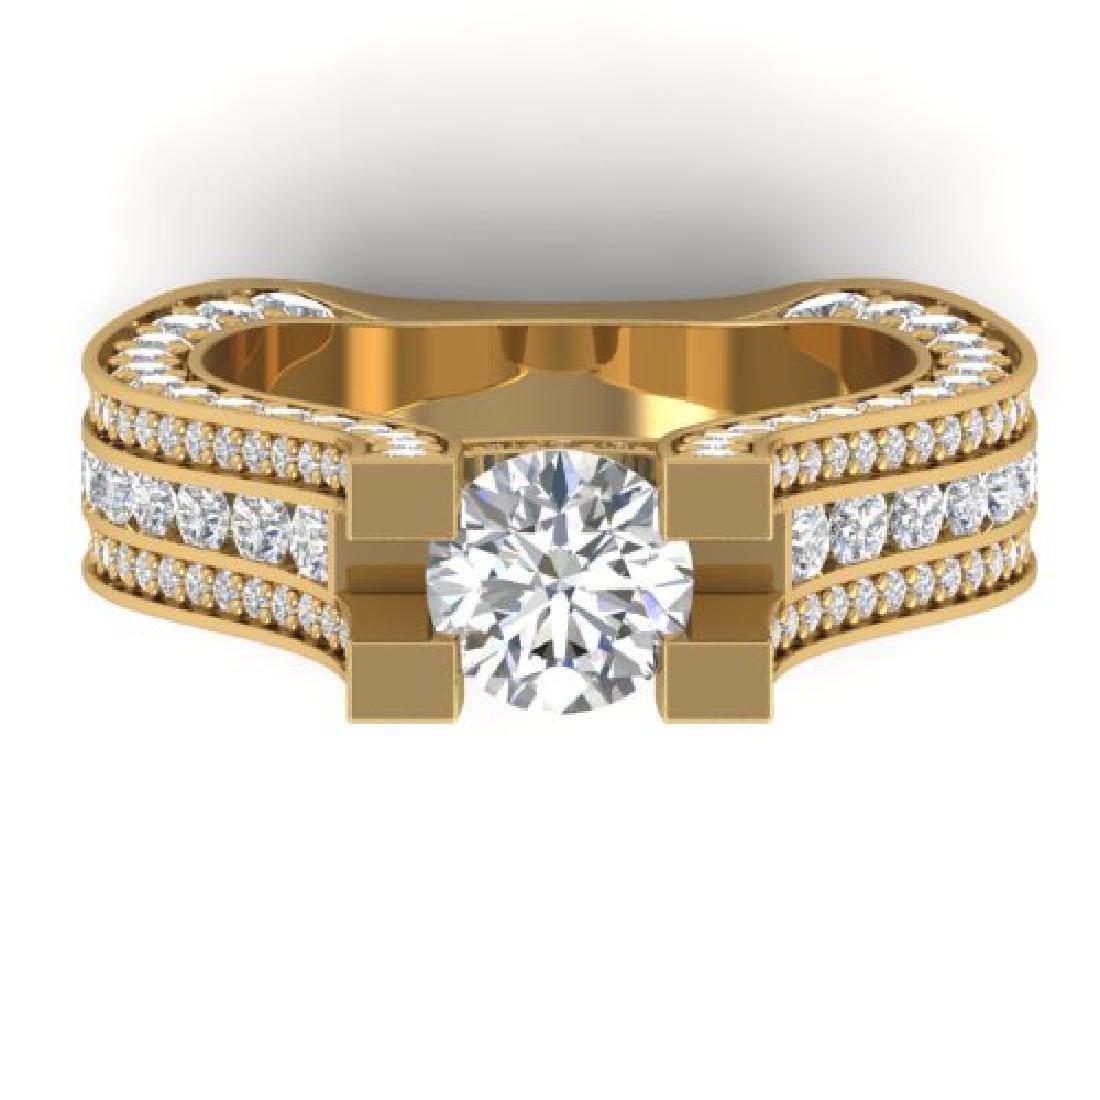 4.5 CTW Certified VS/SI Diamond Art Deco Micro Ring 18K